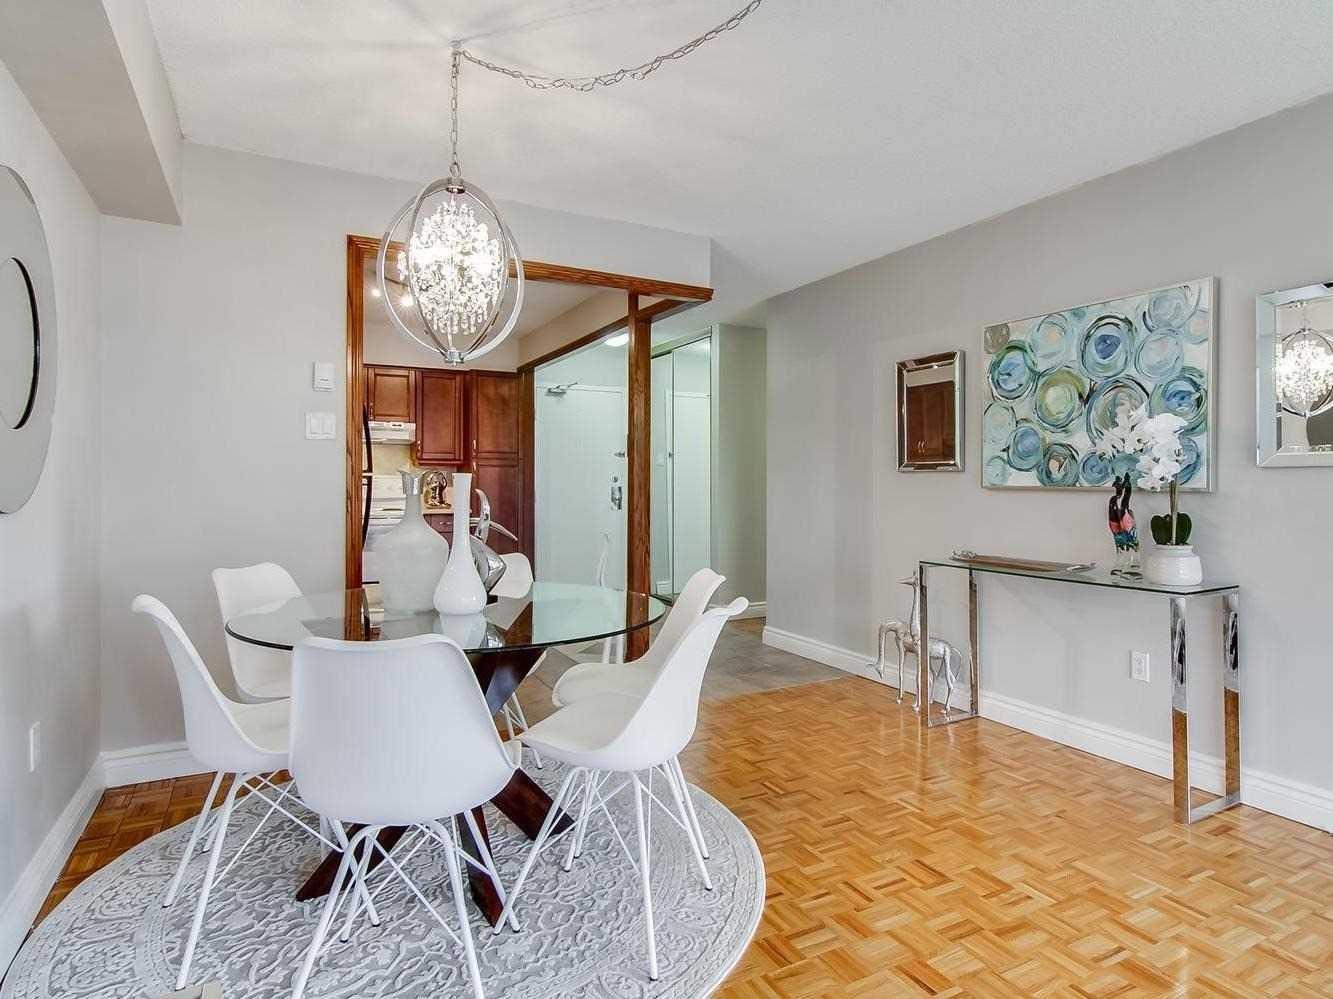 Dining Room, Bar, Kitchen, 3380 Eglinton, Scarborough Condo Staging